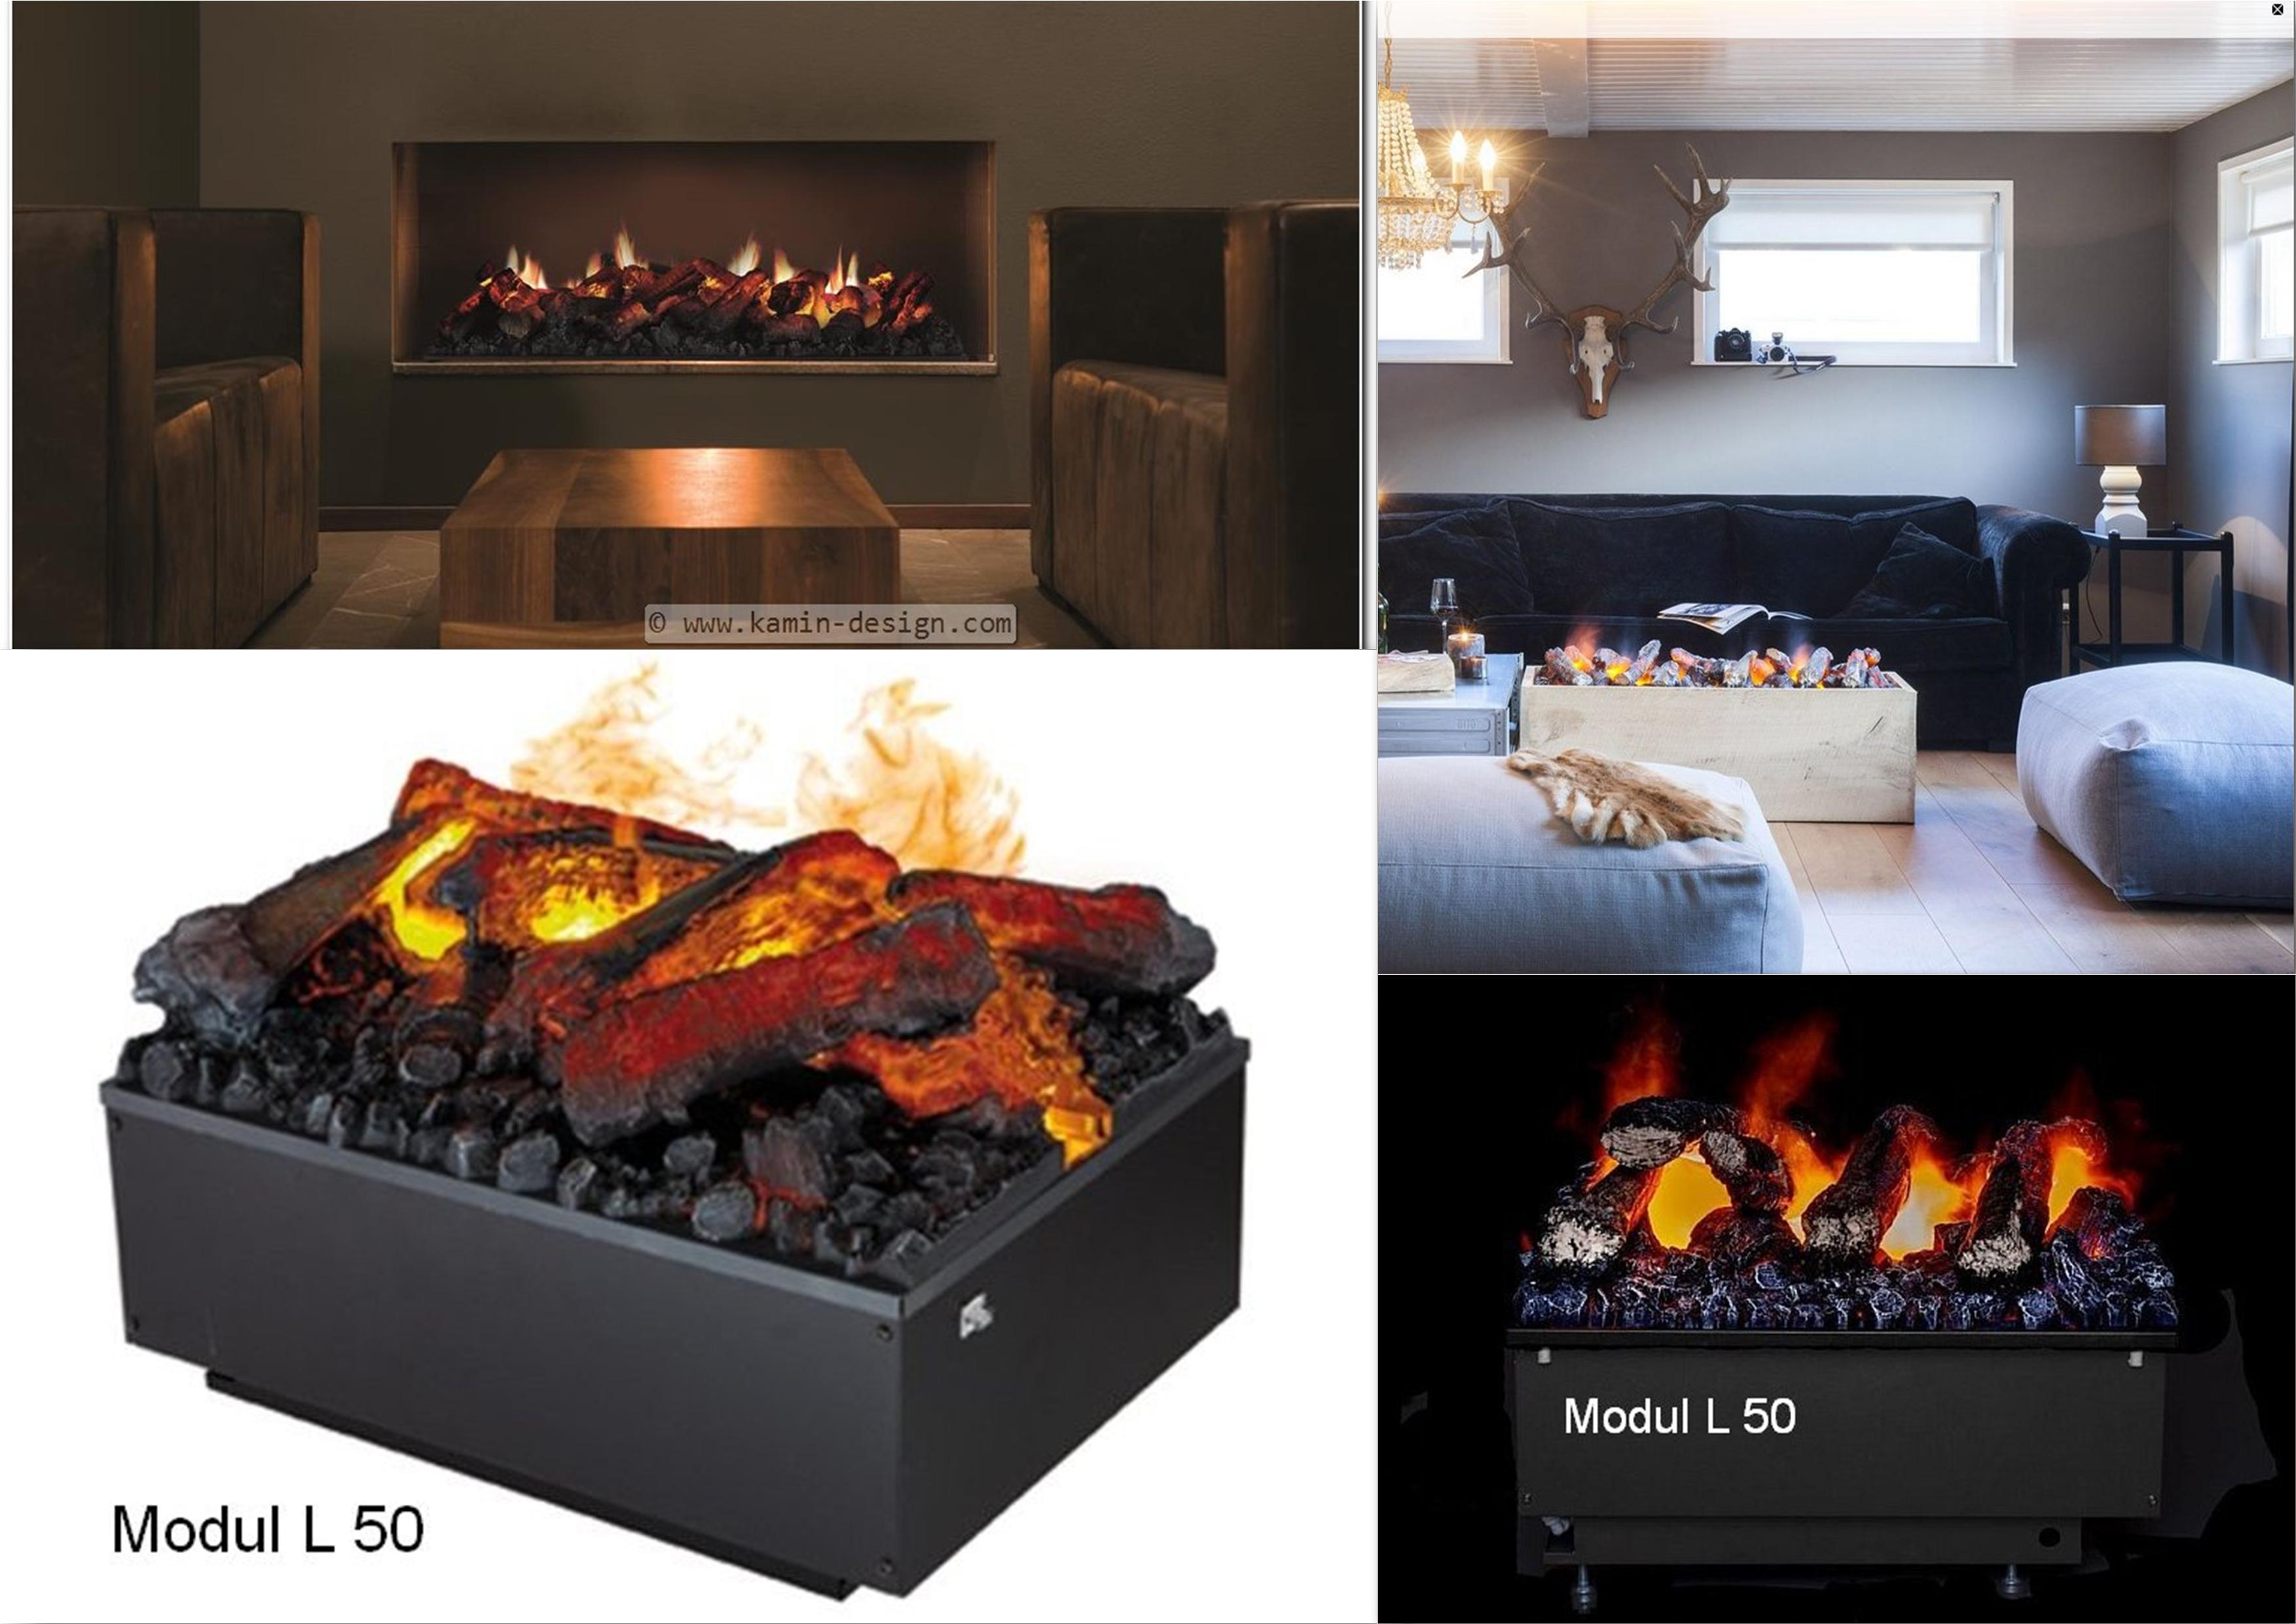 elektrokamin 3d flammeneffekt elektrokamin kaminofen 1800w elektrischer kamin mit 3d. Black Bedroom Furniture Sets. Home Design Ideas